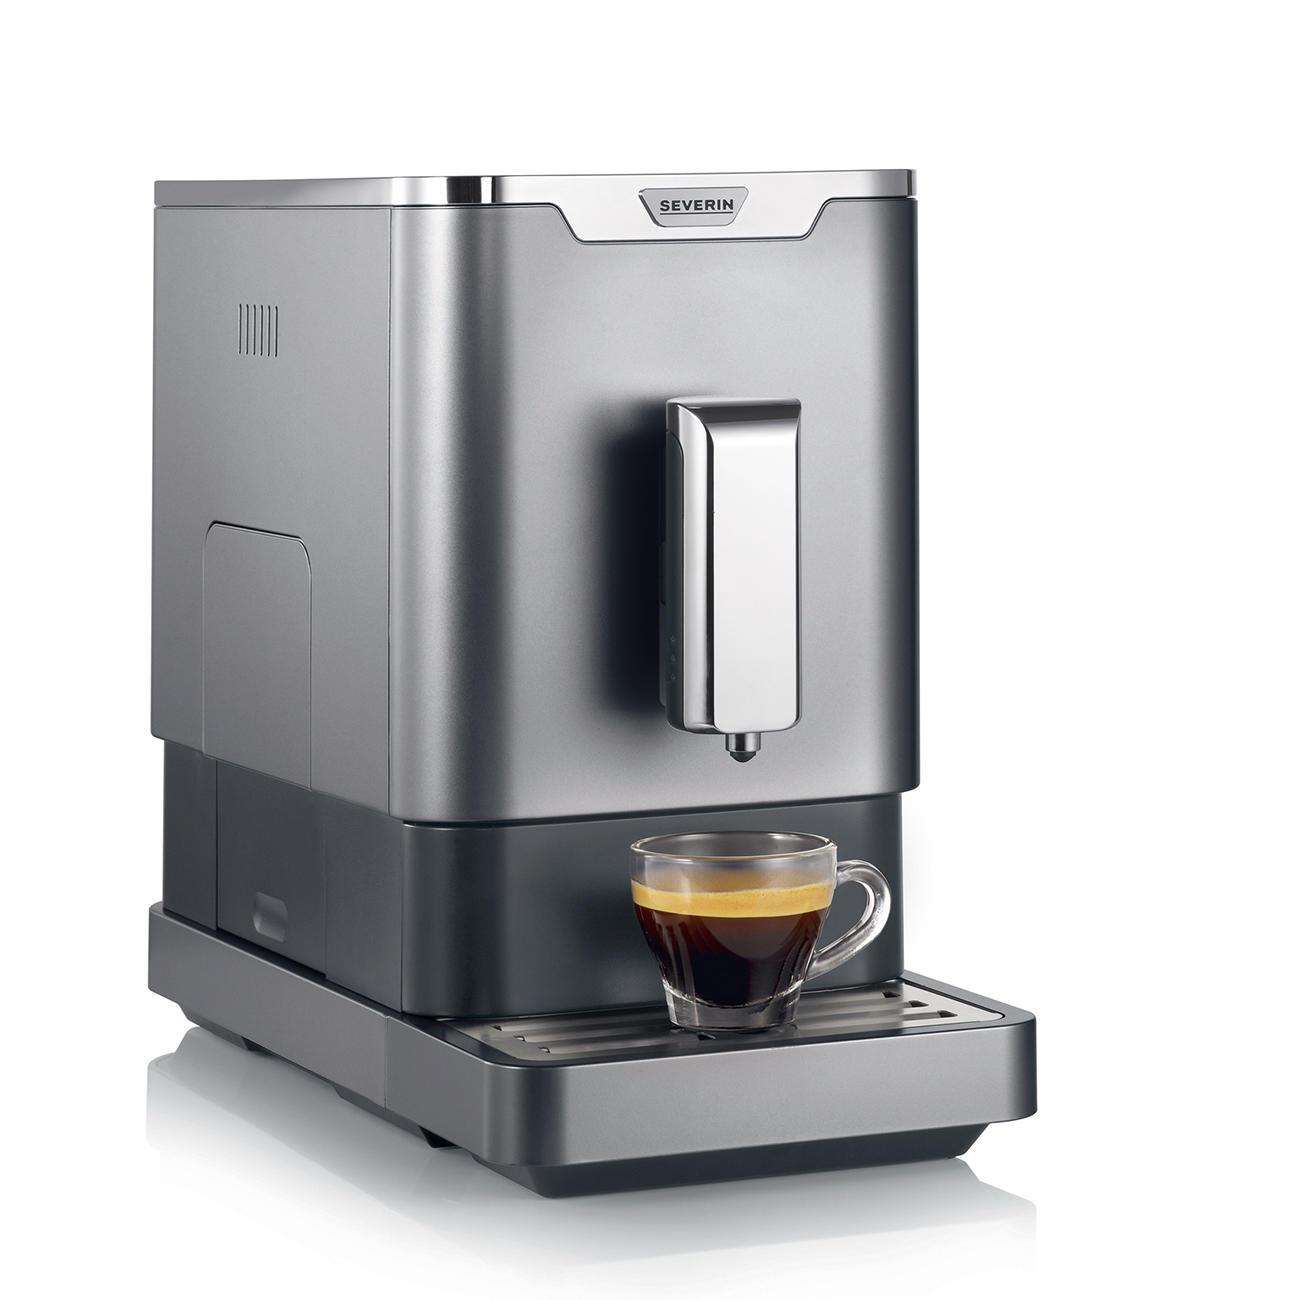 severin kaffeevollautomat kv 8090 grau schwarz kaufen. Black Bedroom Furniture Sets. Home Design Ideas